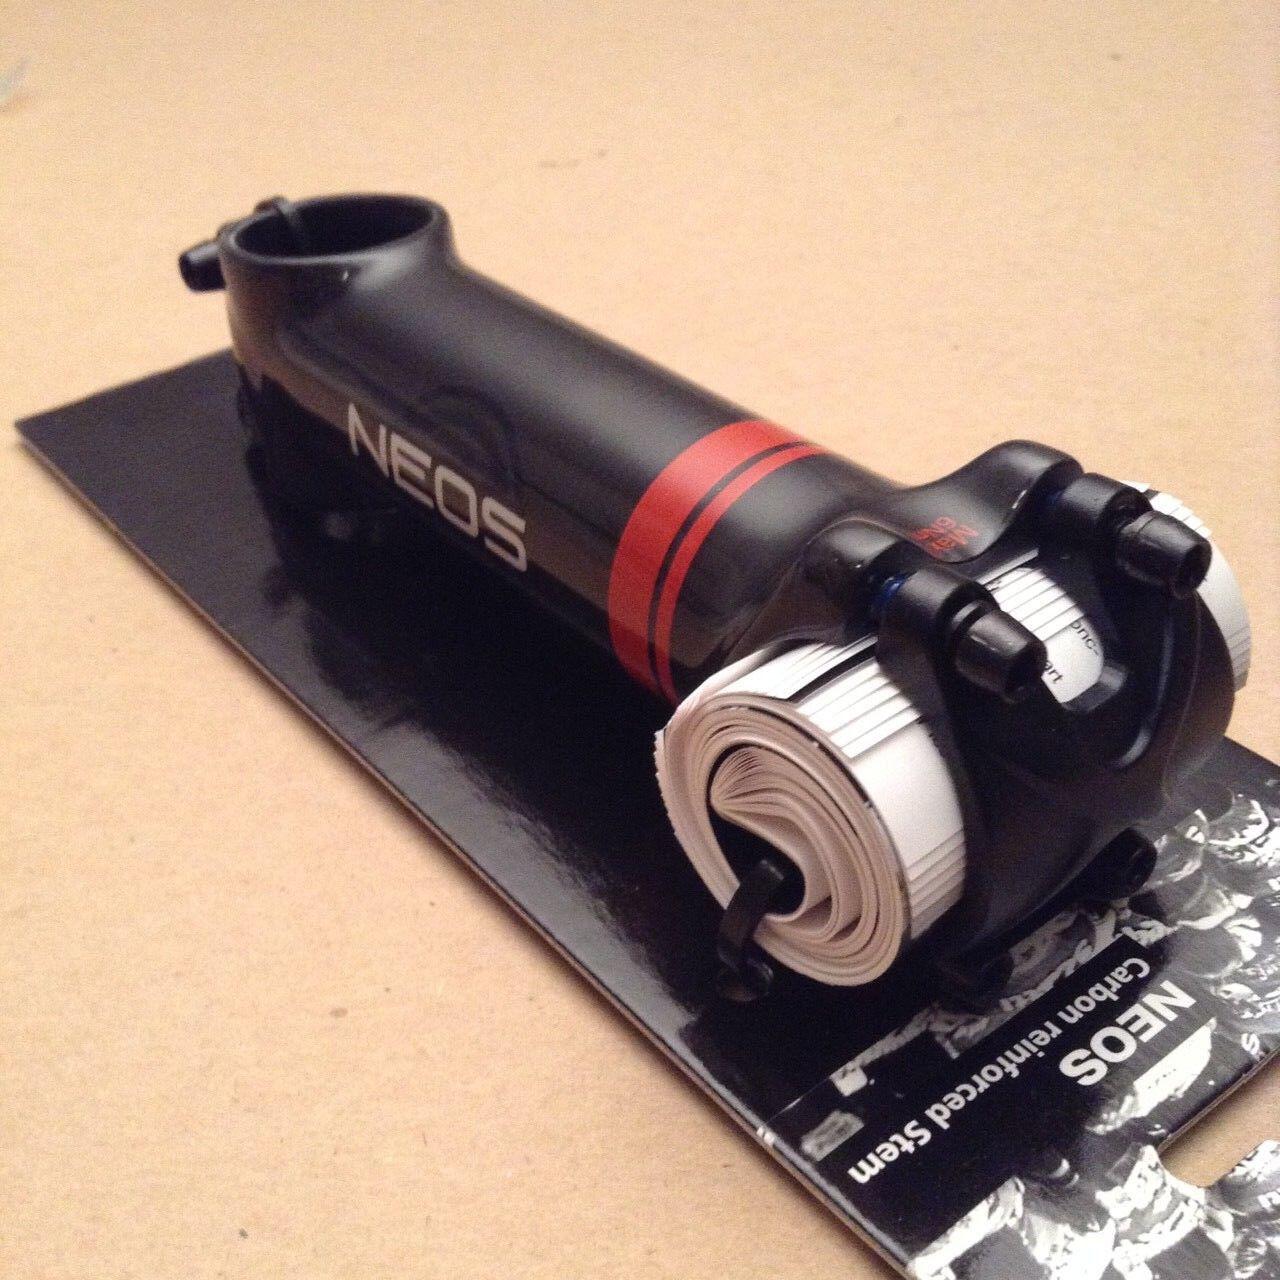 Cinelli Neos Aluminio Cochebono Vástago Reforzado 31.8mm X 120mm